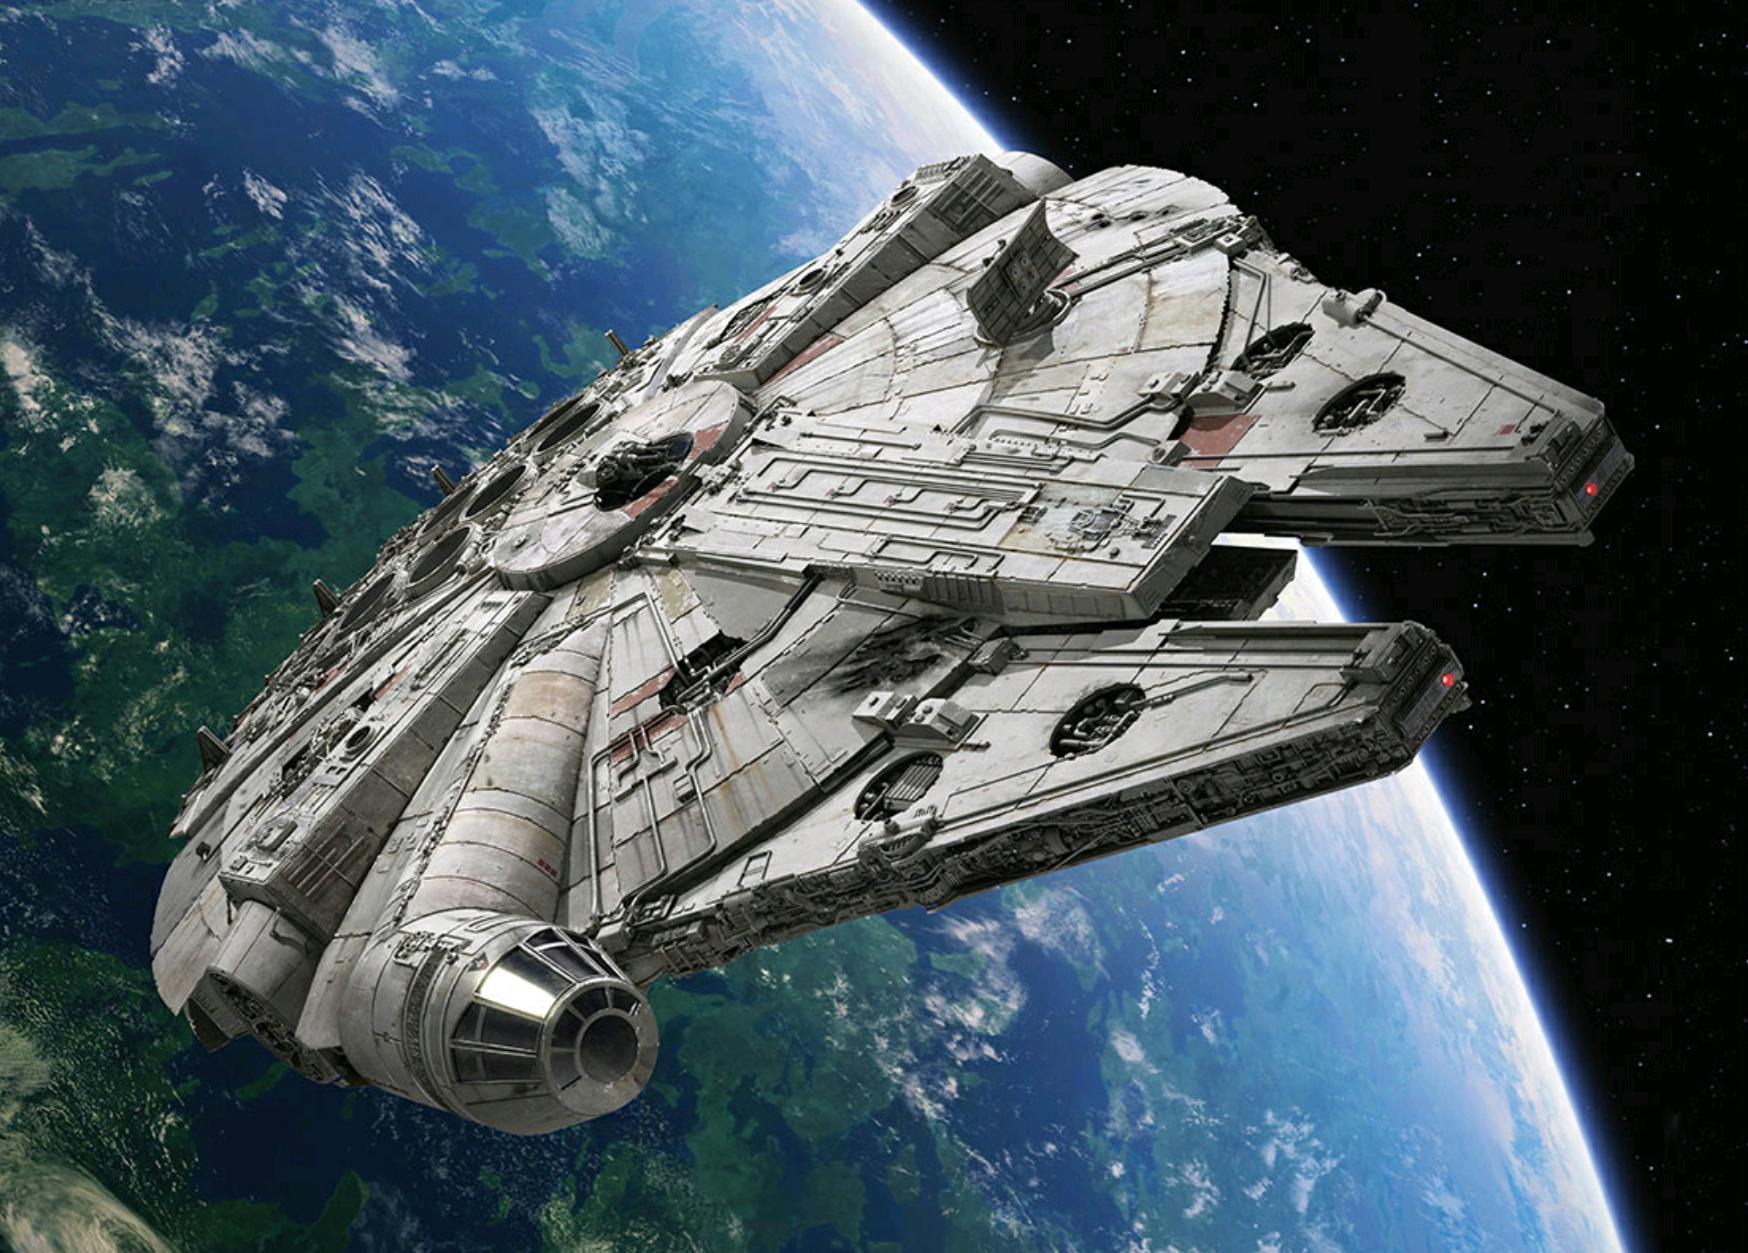 Millennium Falcon?